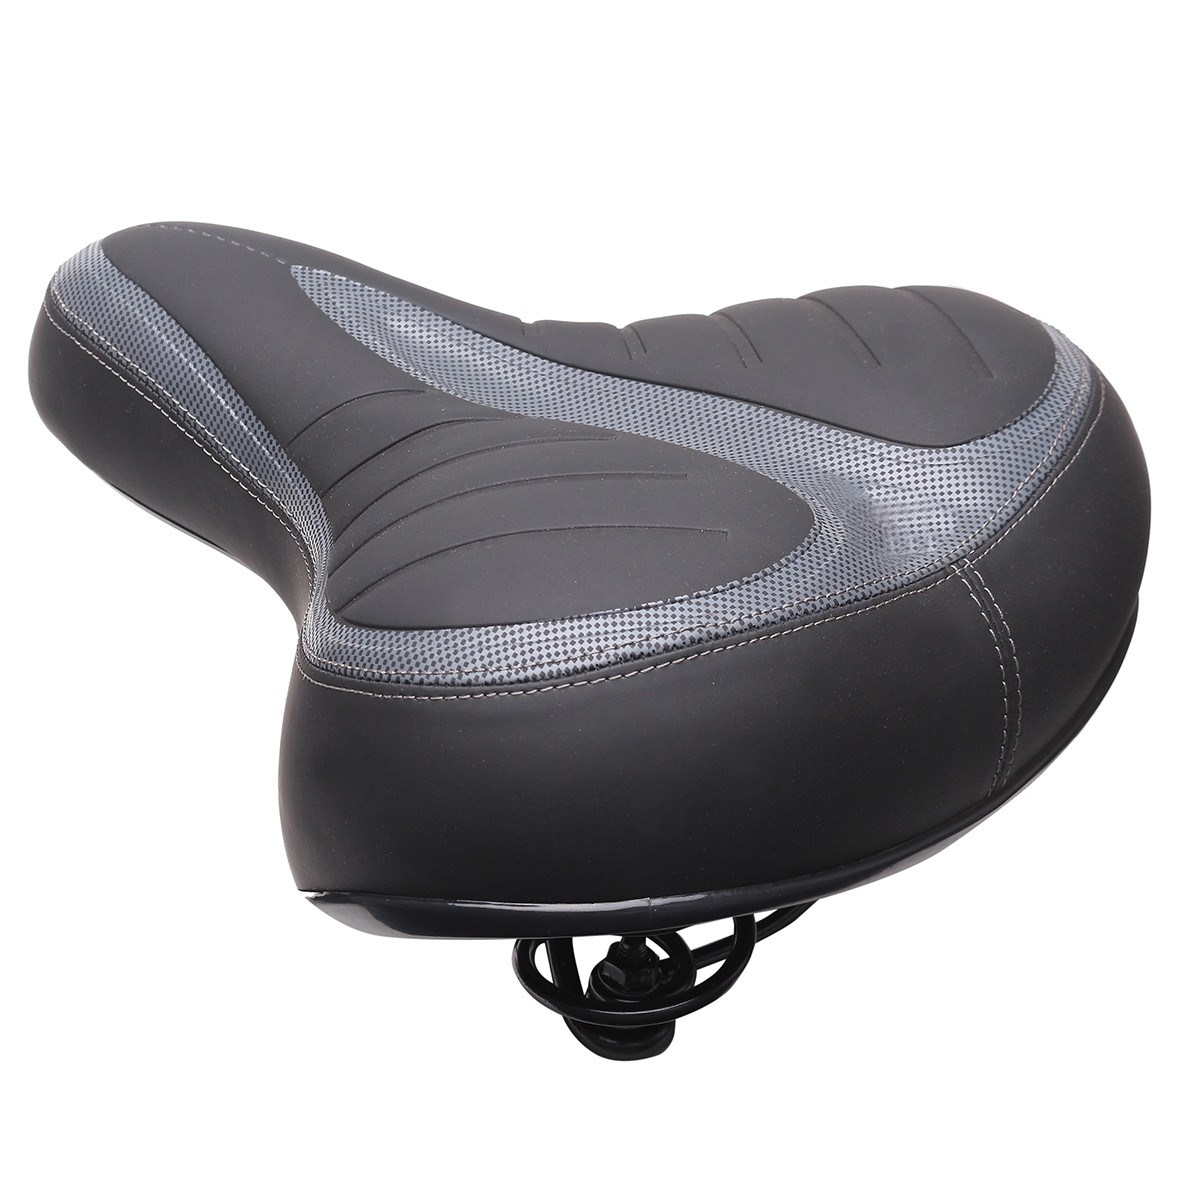 Bicycle Saddle Bicycle Parts wide road Cycling <font><b>Seat</b></font> Mat Comfortable Cushion Soft <font><b>Seat</b></font> Cover for Bike MTB Bike Bicycle parts